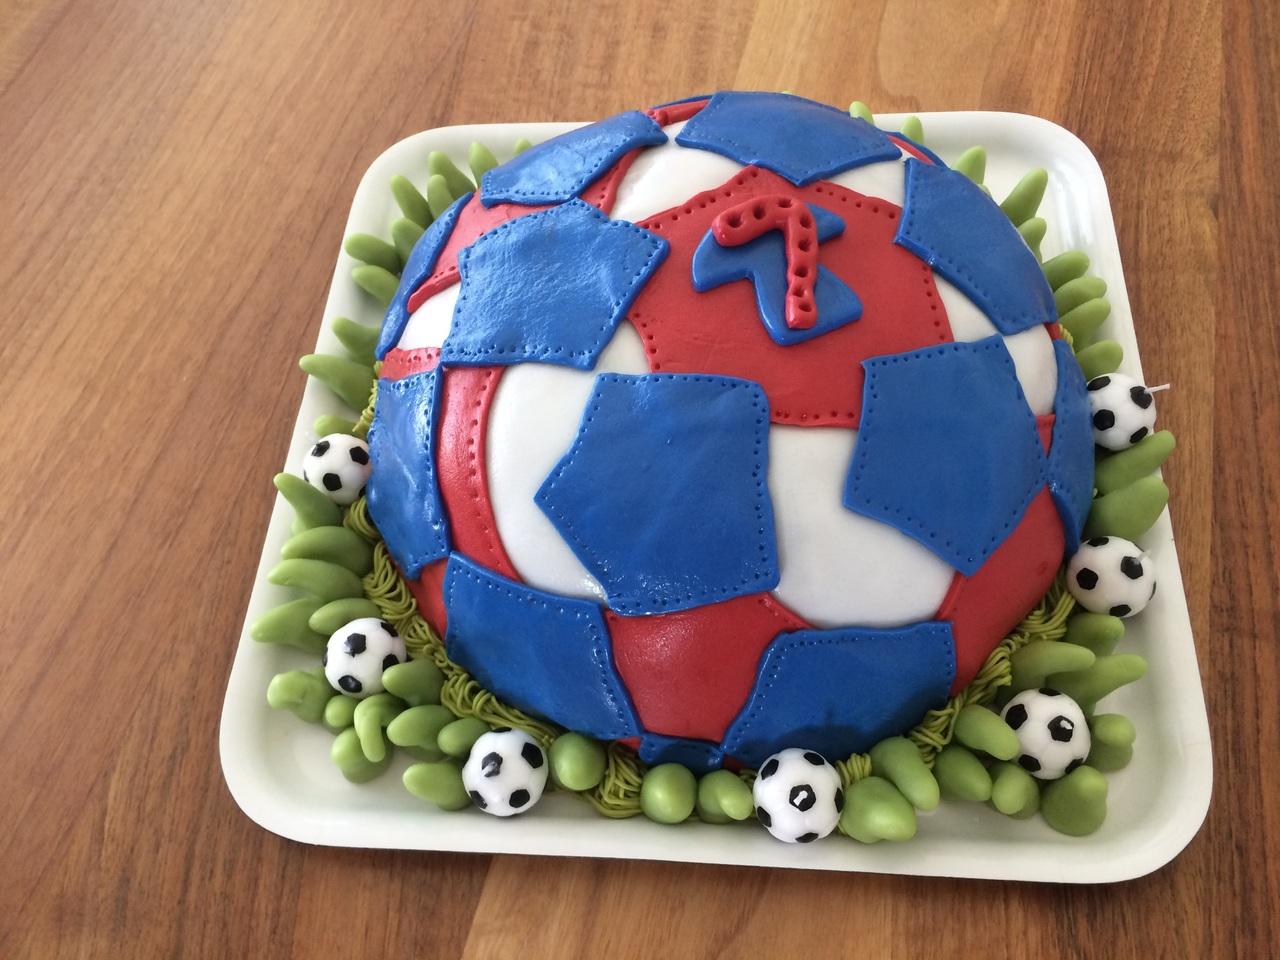 sweet-celebration-food-red-blue-football-684075-pxhere.com